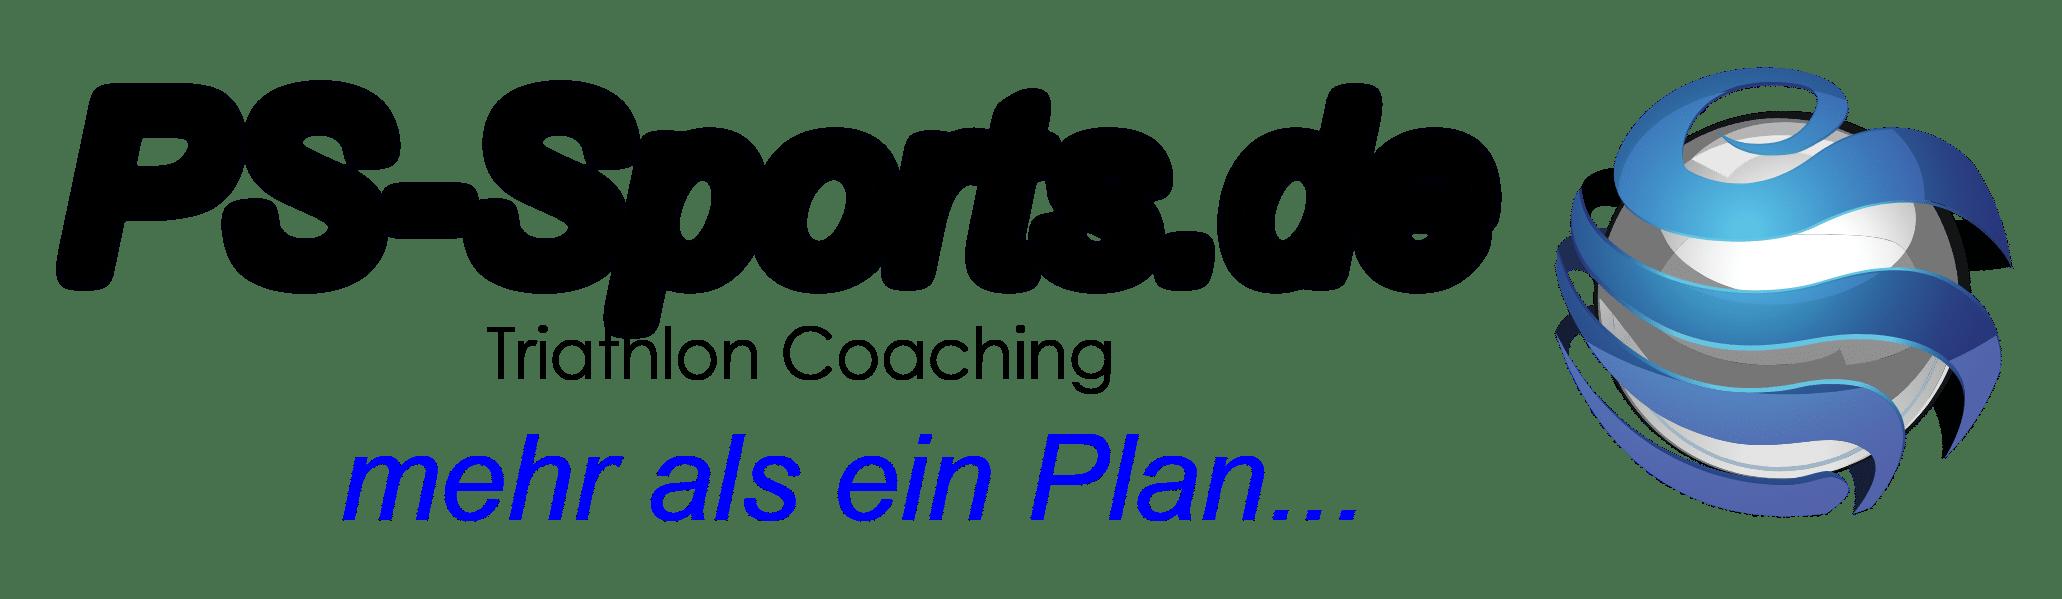 PS-Sports.de Triathlon Coaching